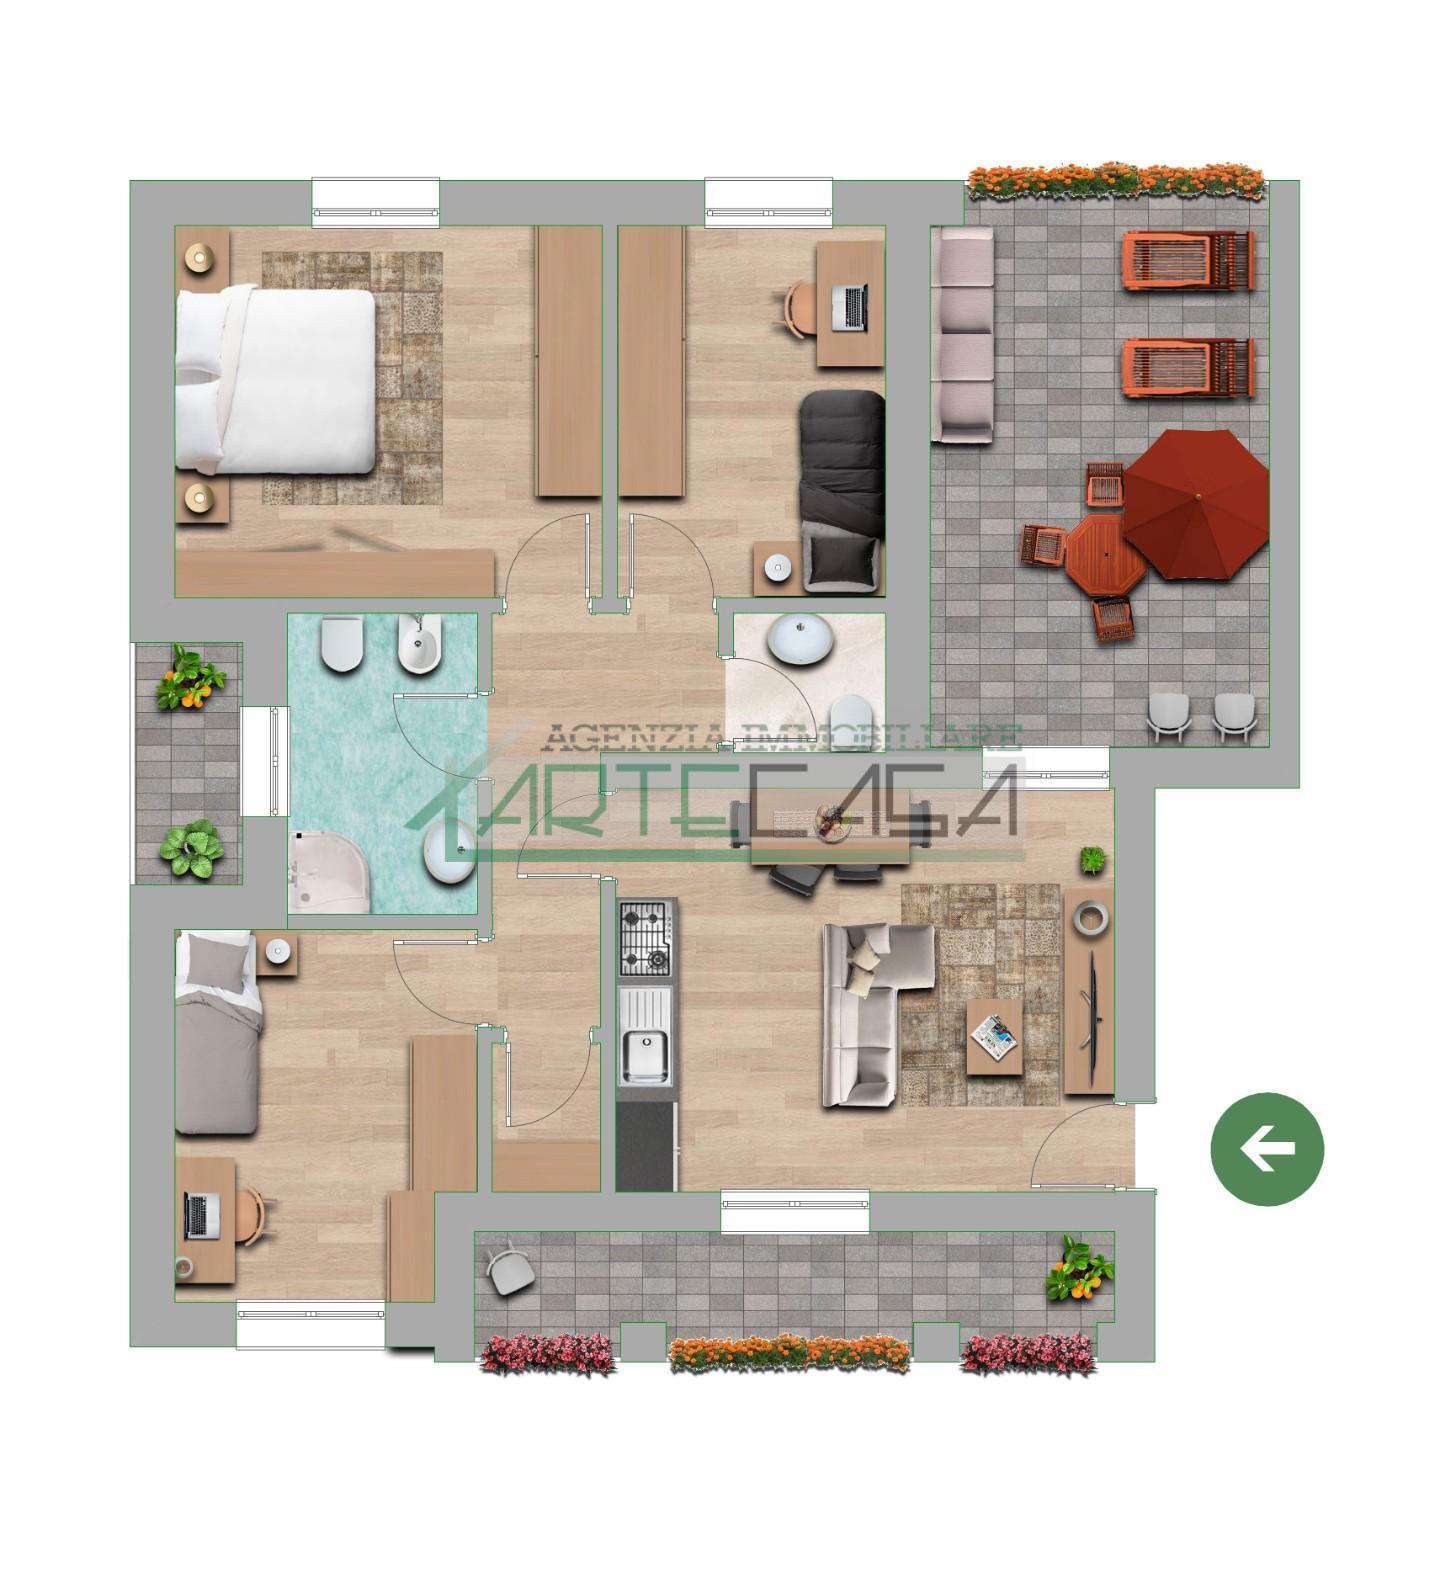 Appartamento in vendita, rif. AC6945